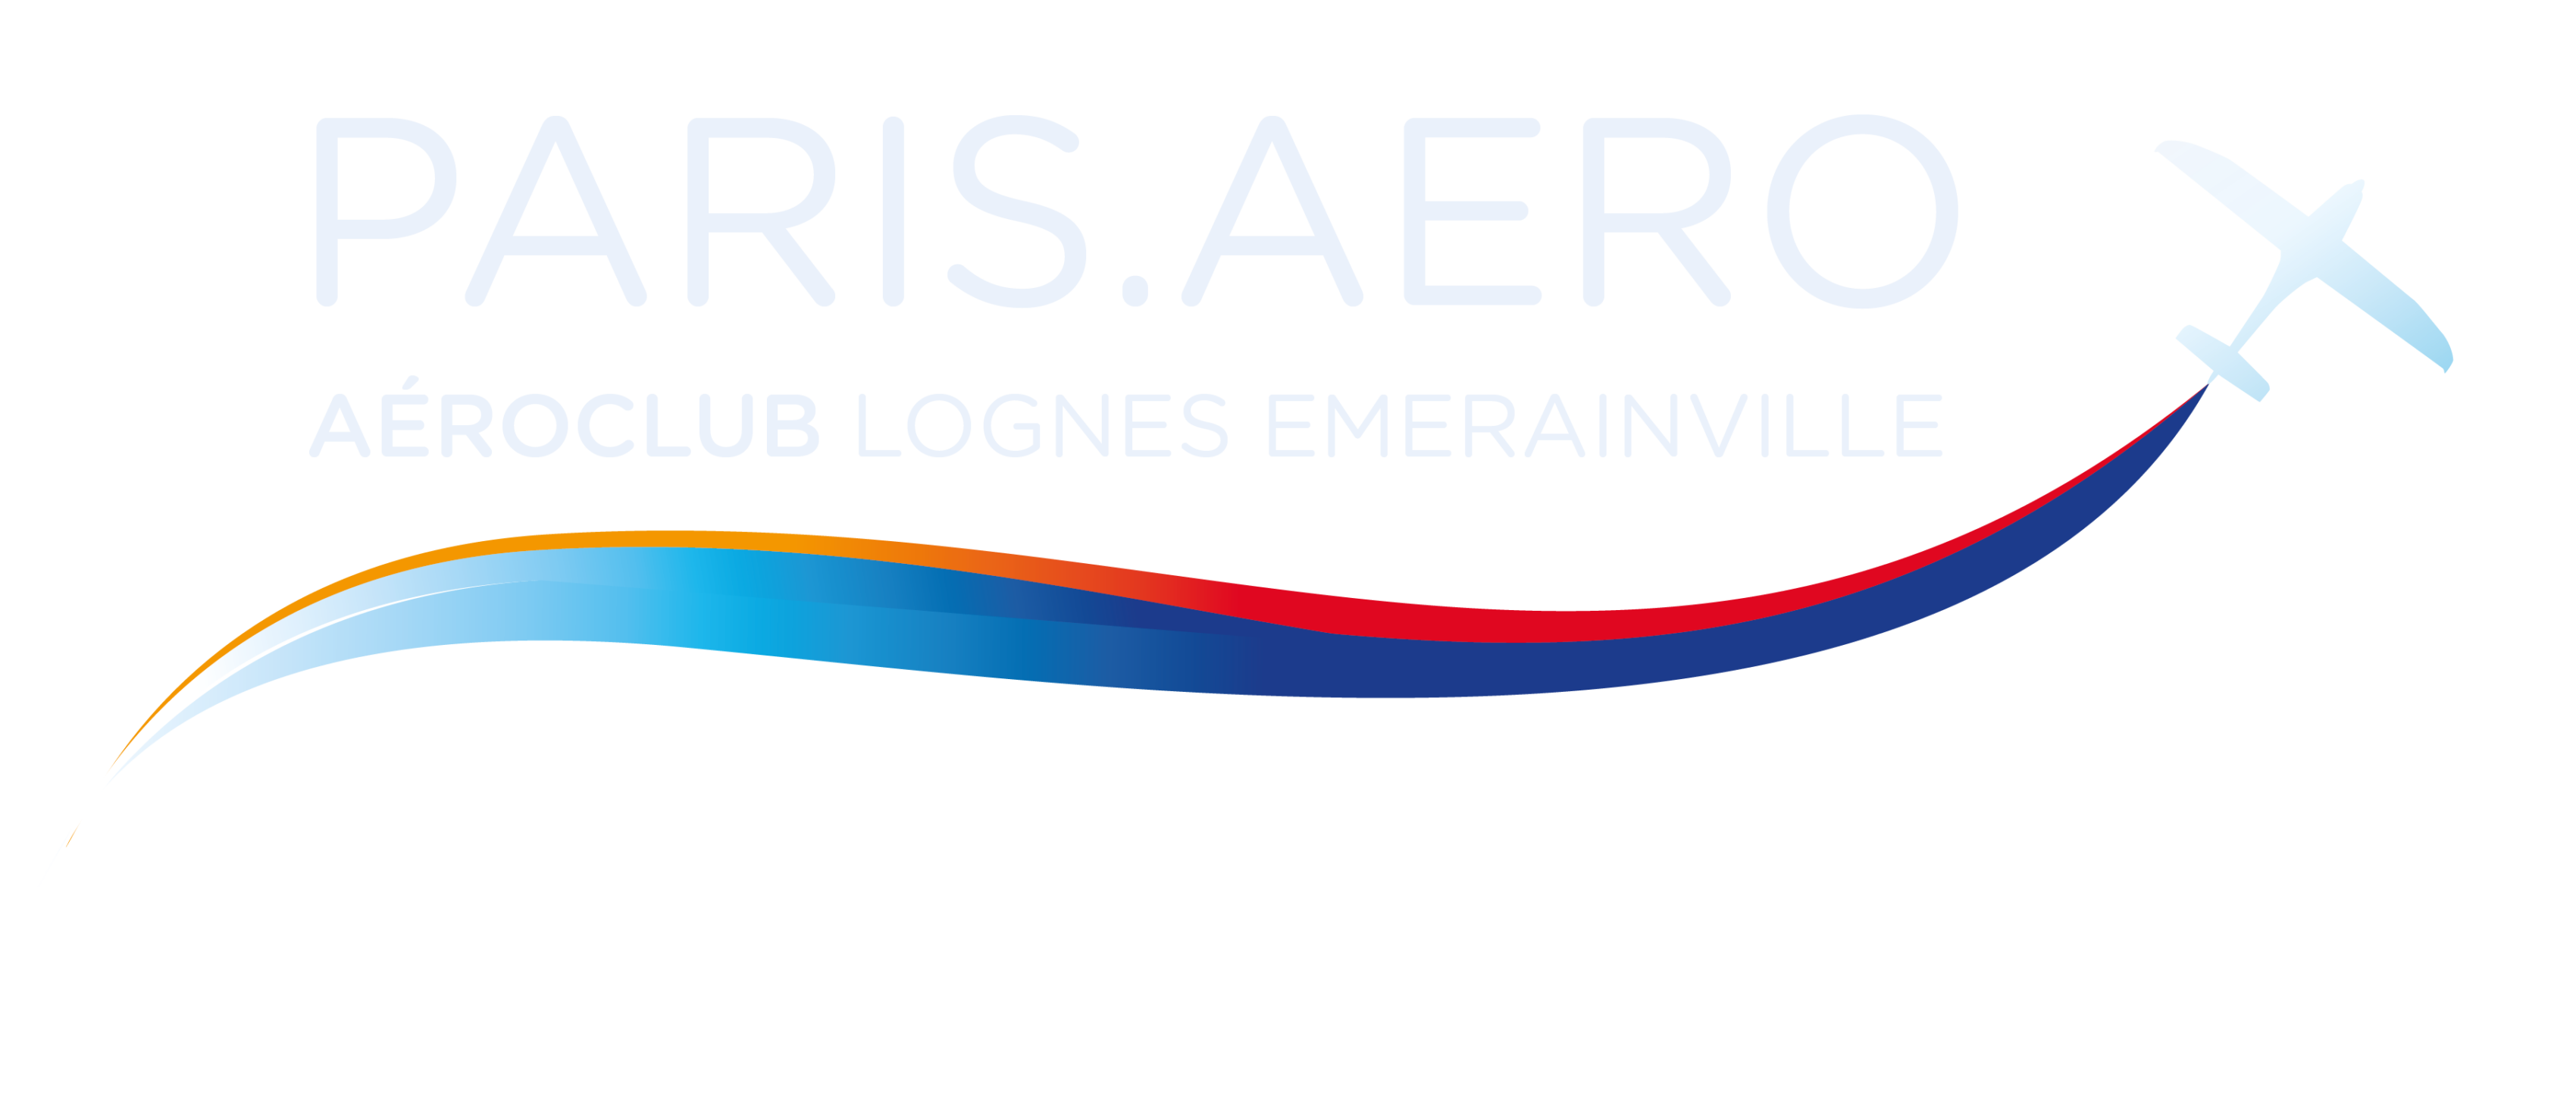 Aéroclub Paris.Aero